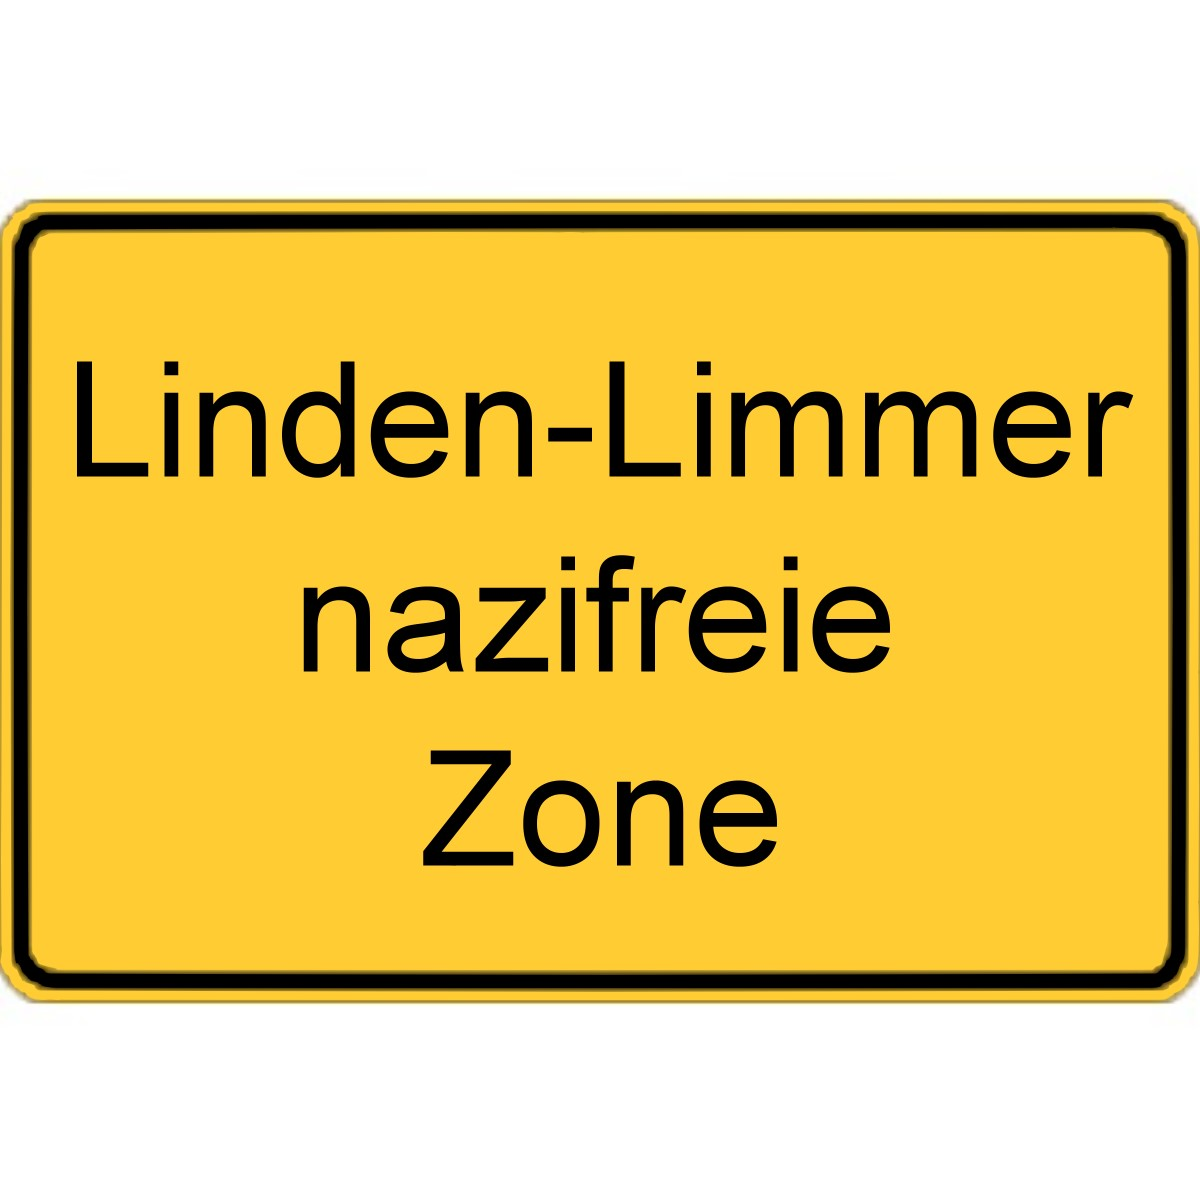 Symbol Nazifrei